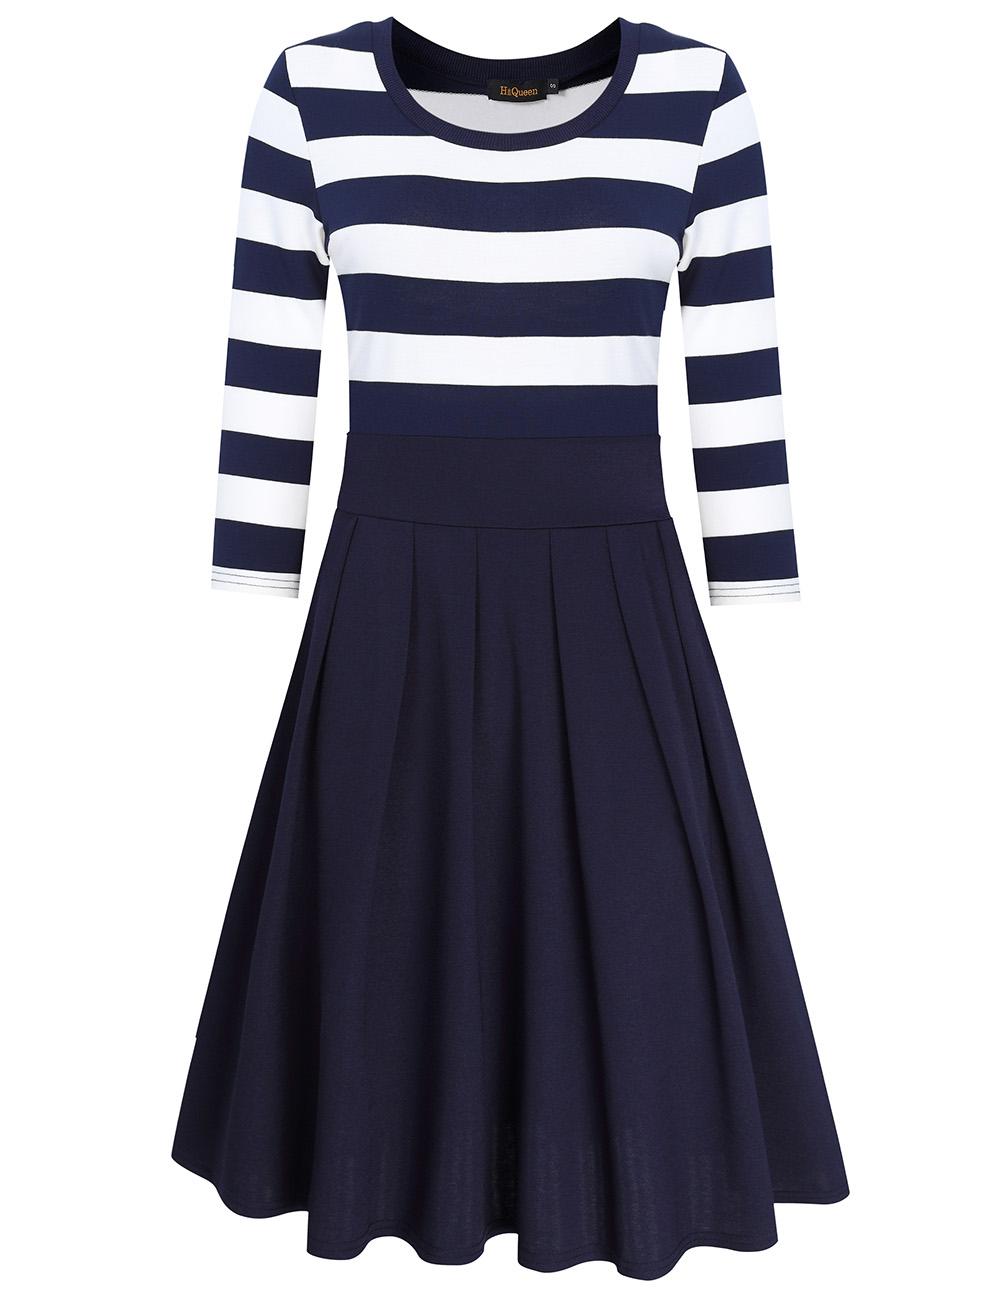 HiQueen Women Casual Scoop Neck 3/4 Sleeve A-Line Swing Dress Stripe Modest Dresses Dark blue_2XL